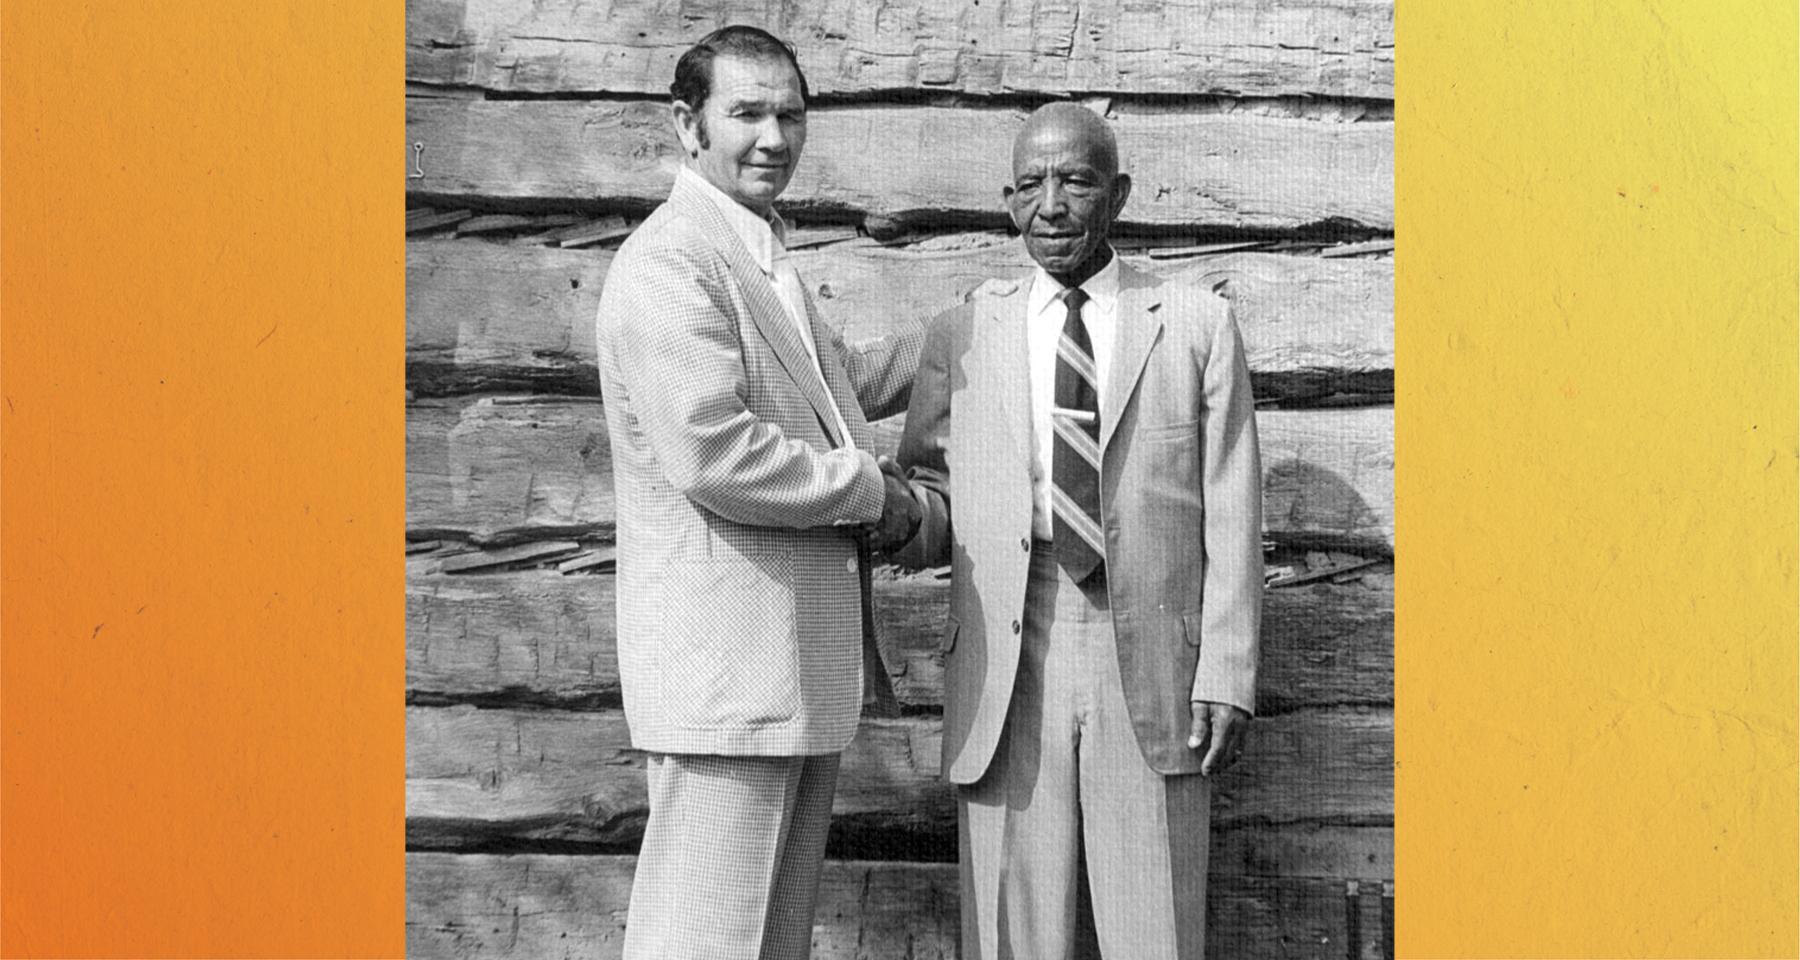 Jimmy Lipkin and Paul Sr.